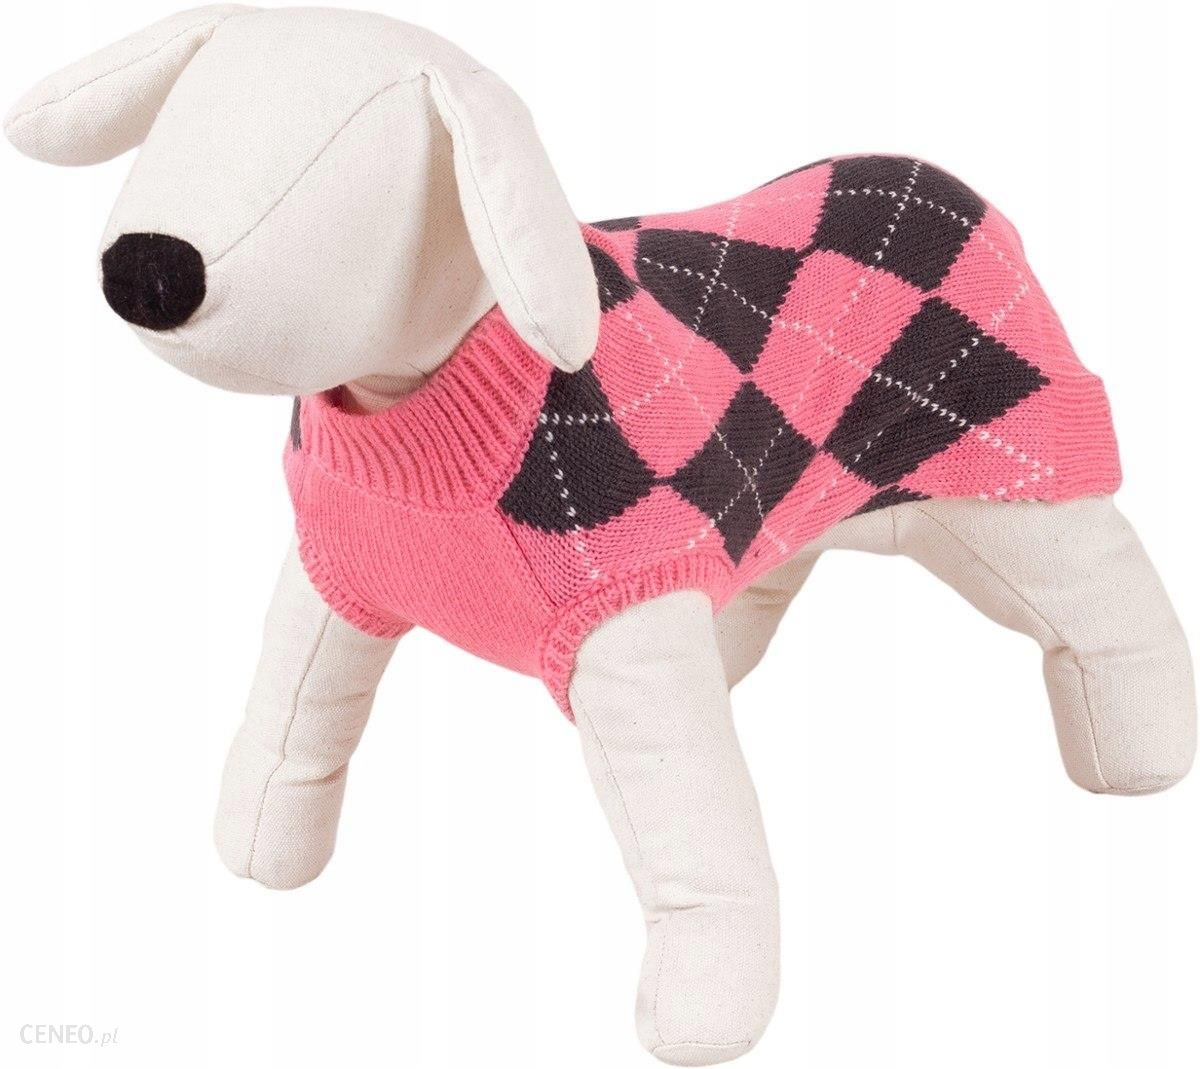 Happet Ubranko Sweterek Dla Psa Romby Róż M-25Cm